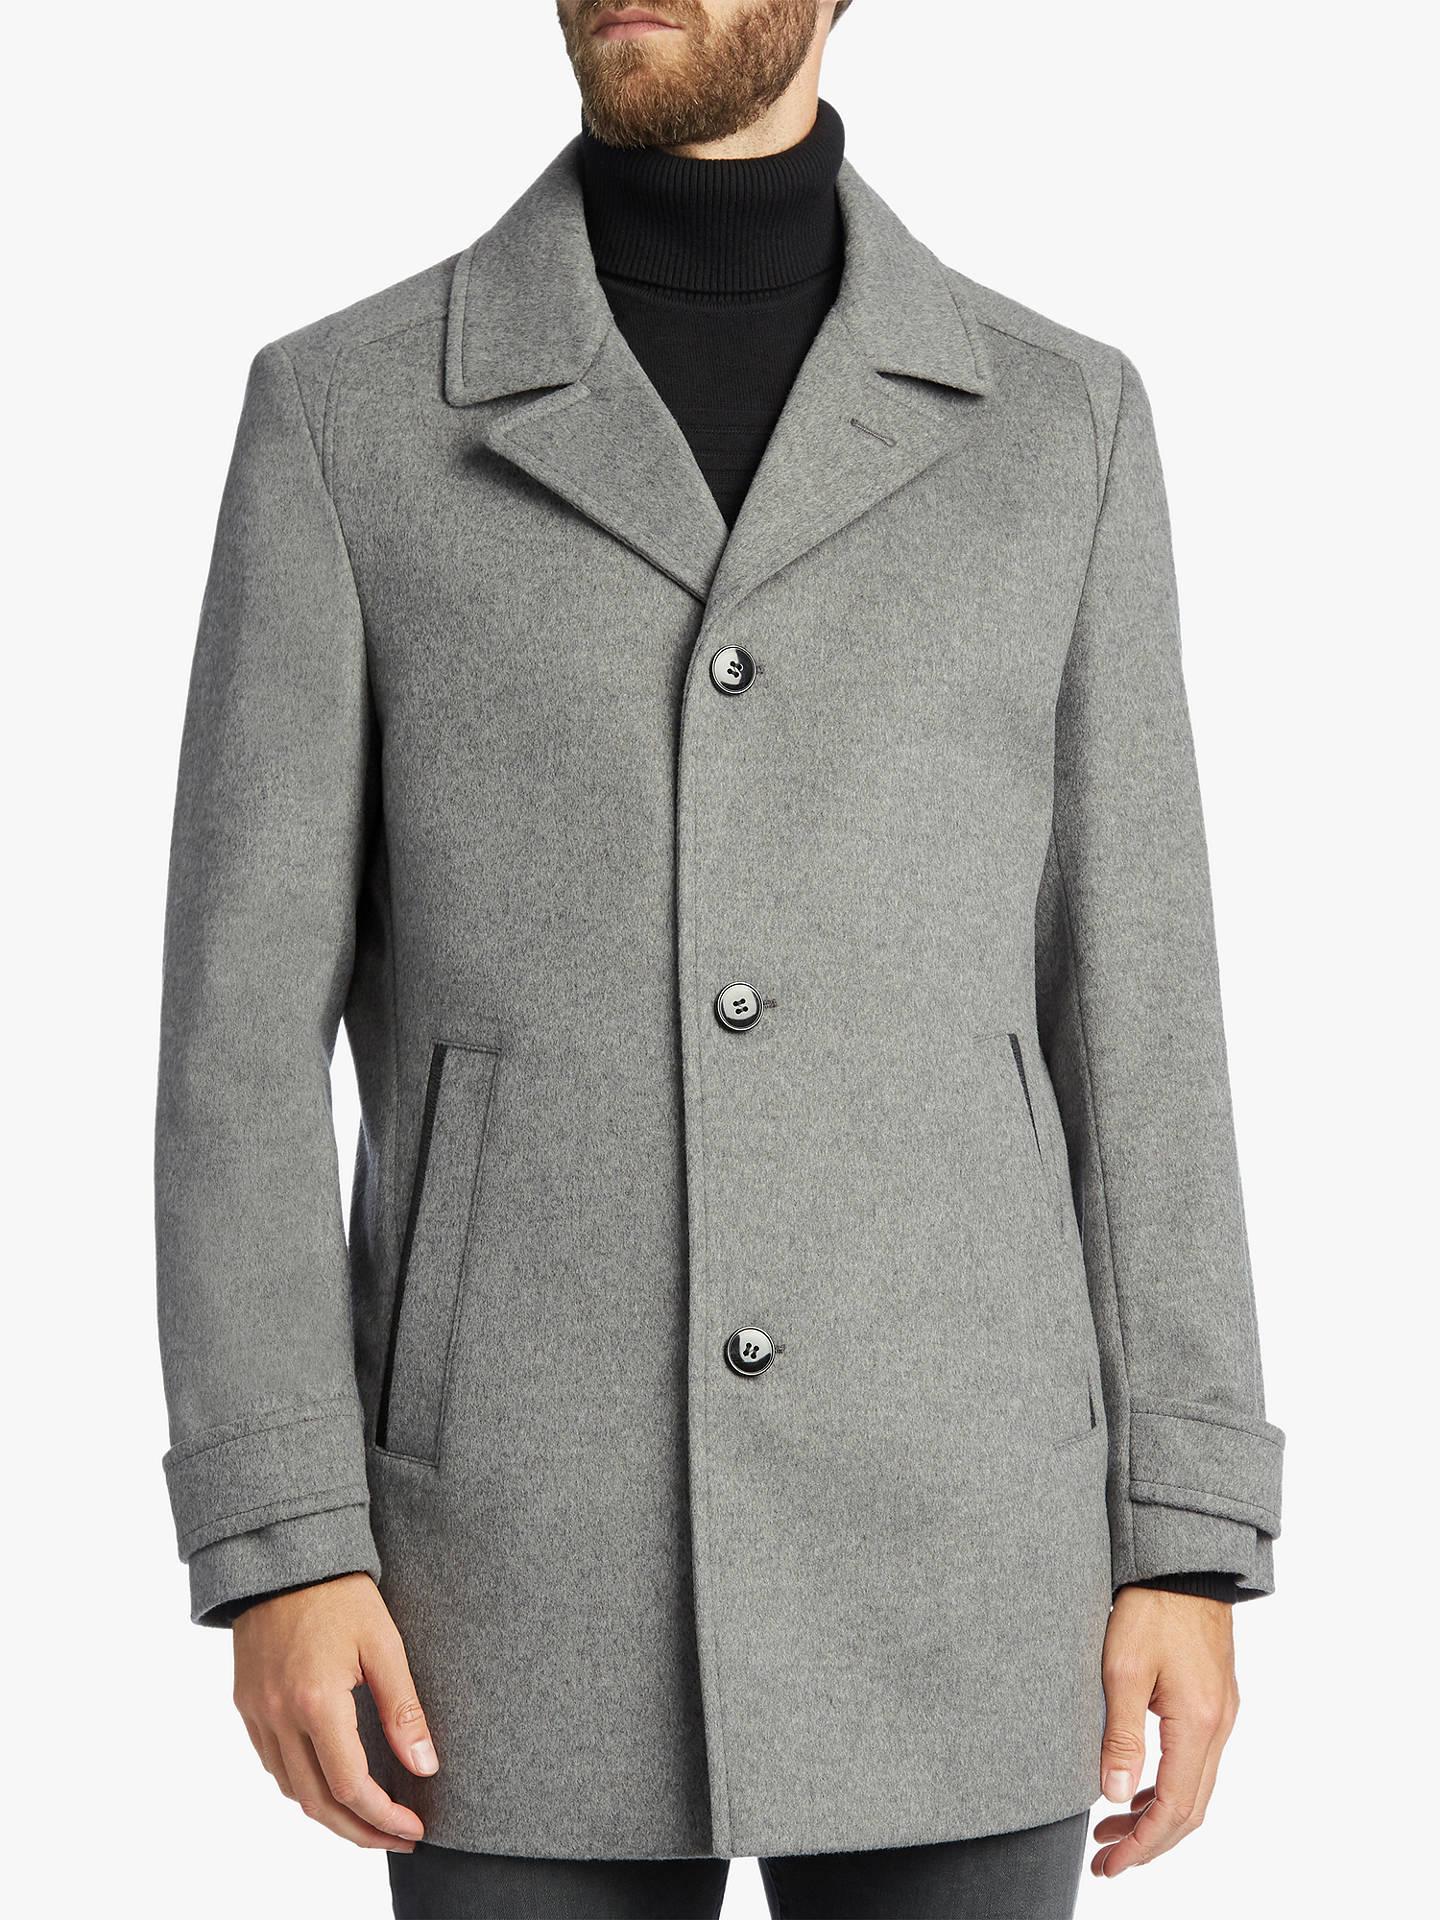 7a44ef0672b5 Buy HUGO by Hugo Boss Midais Virgin Wool Cashmere Melange Coat